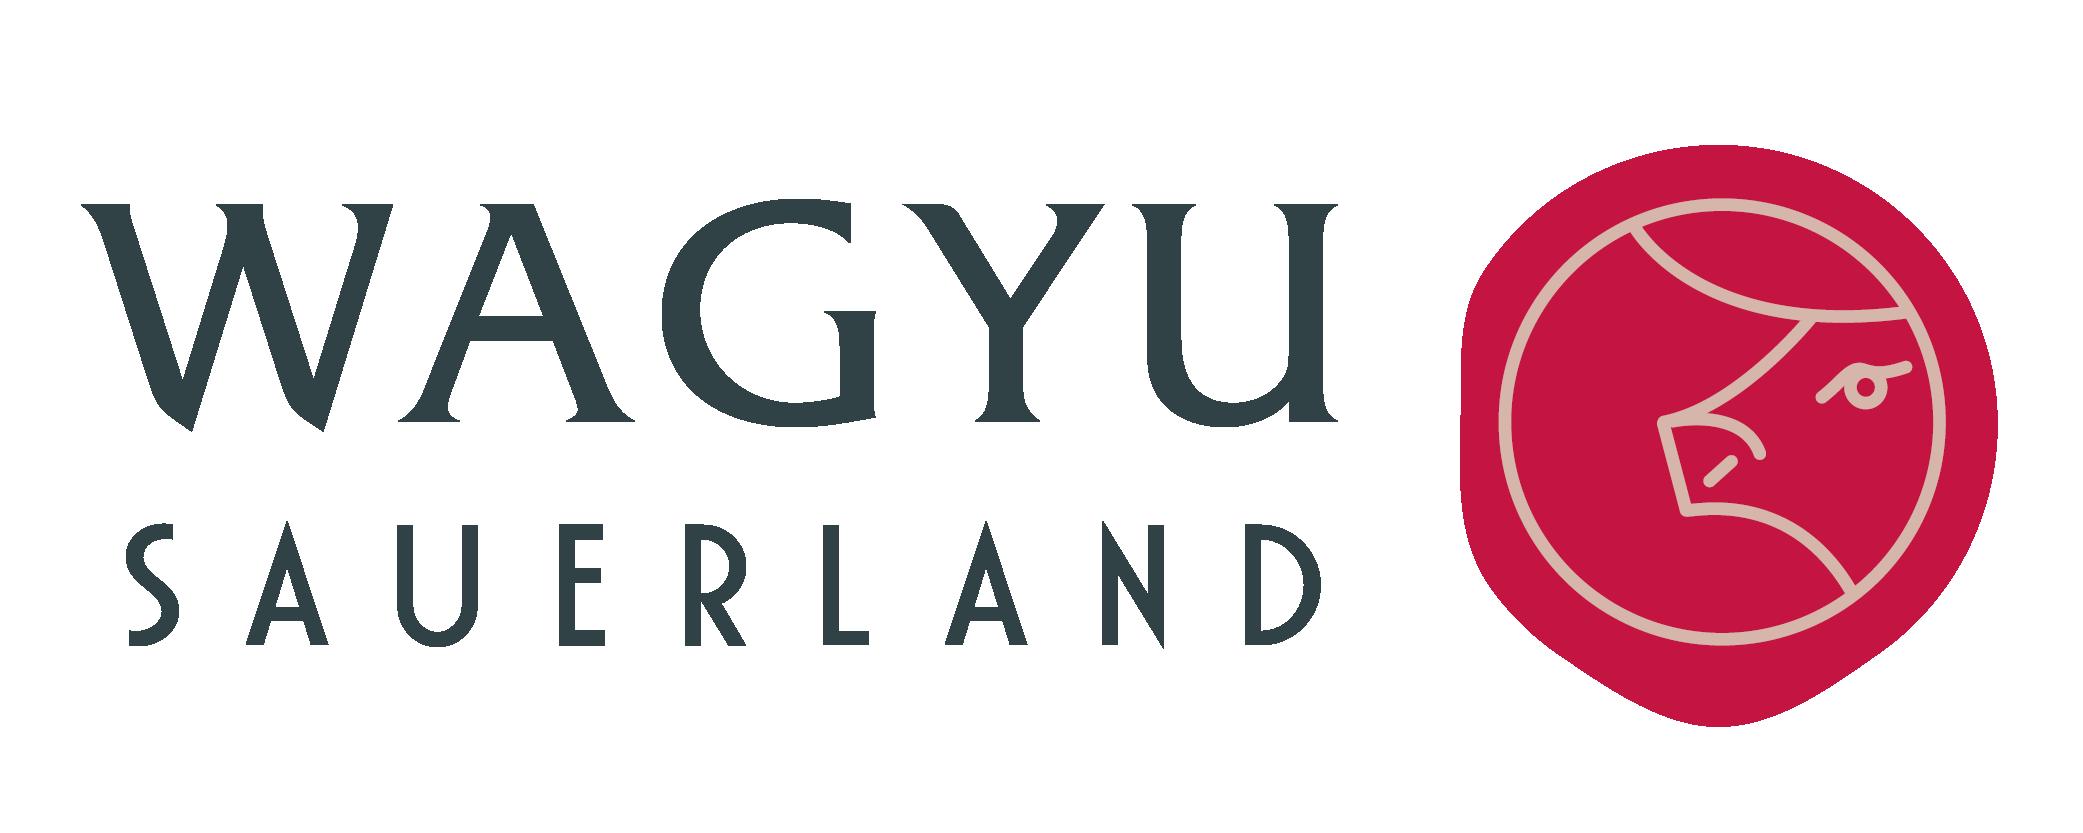 Wagyu Sauerland GbR